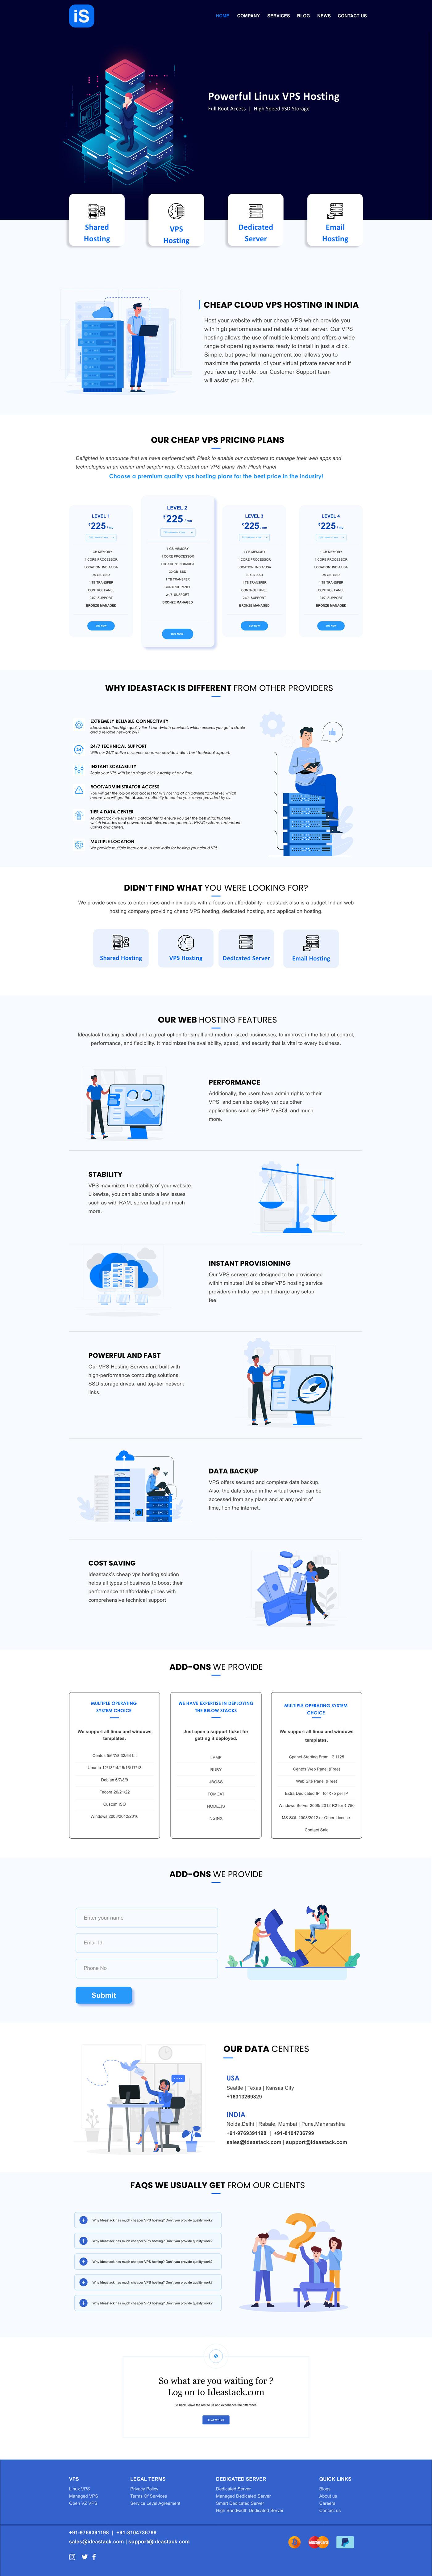 godaddy graphic designing hosting provider layout Layout Design Prototyping ui design ui/ux designing user interface design website designing wireframing